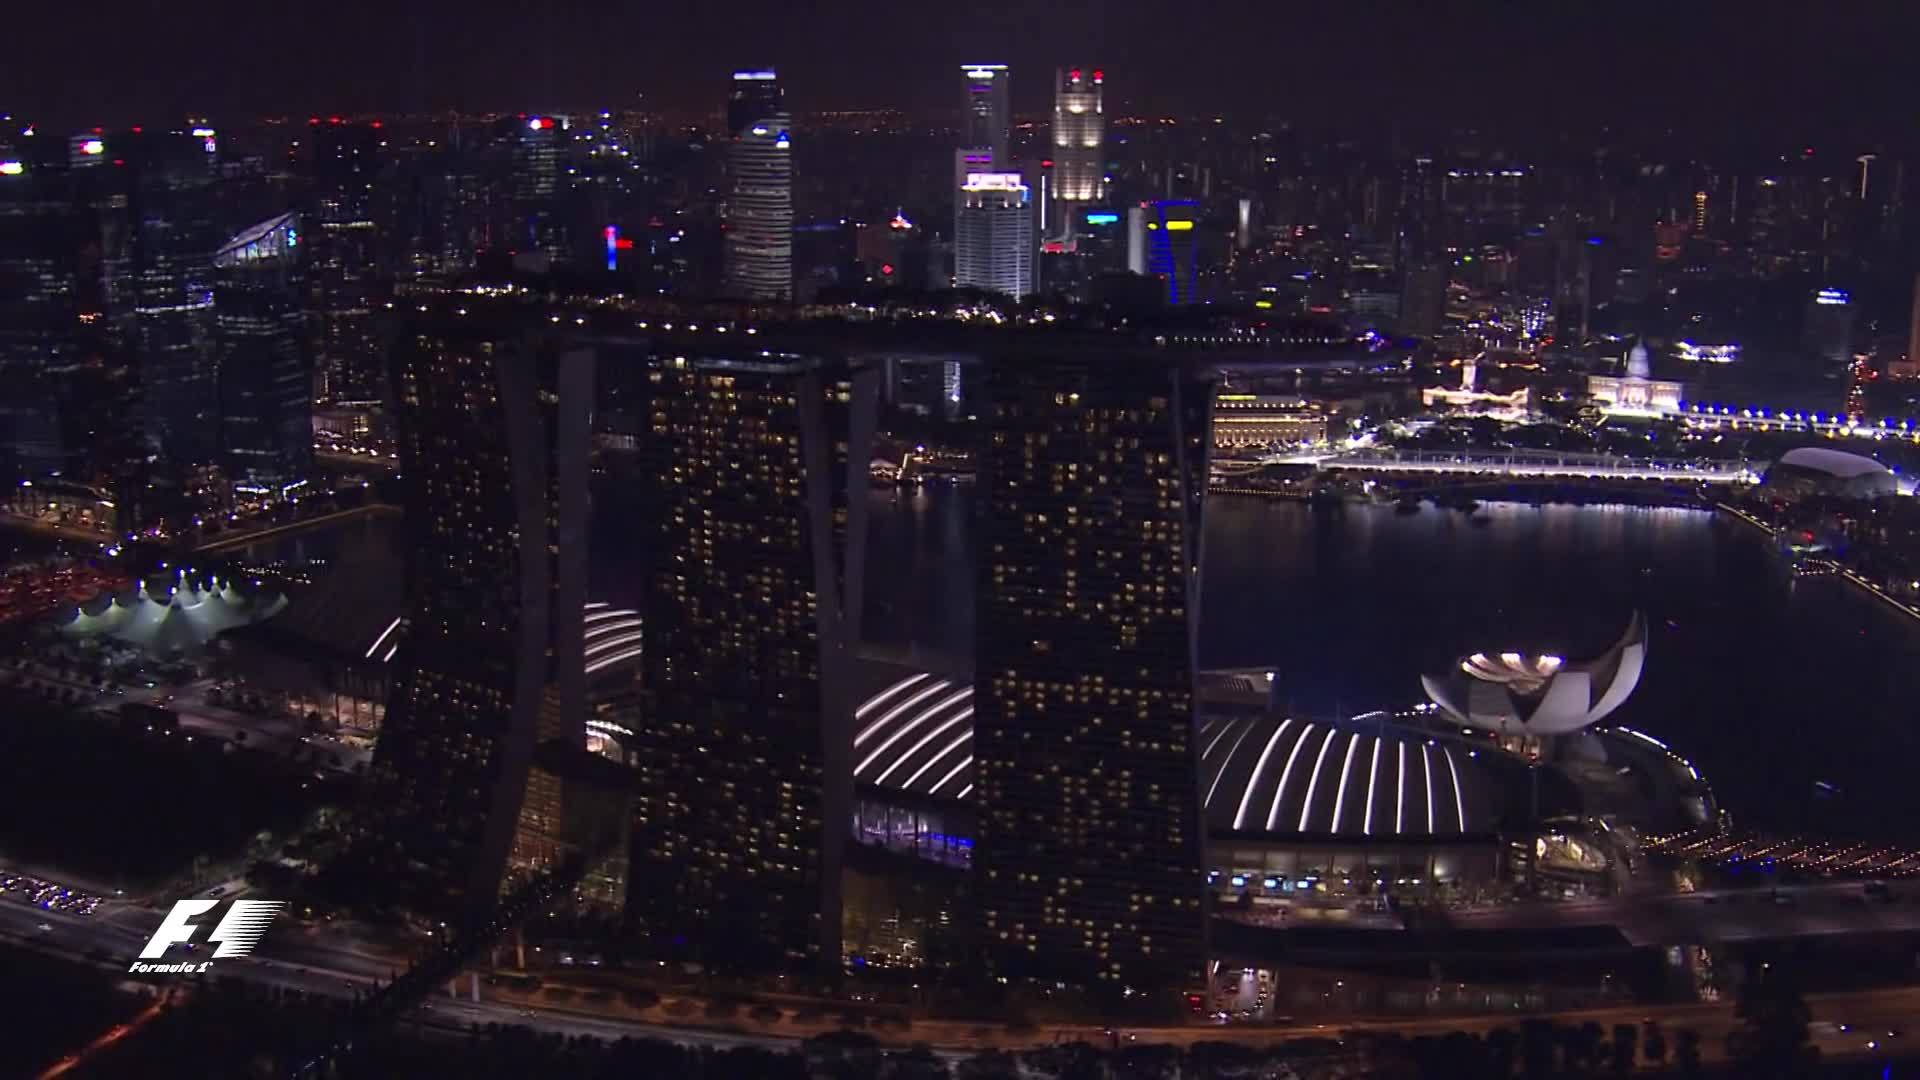 f1, sport, sports, Singapore GIFs